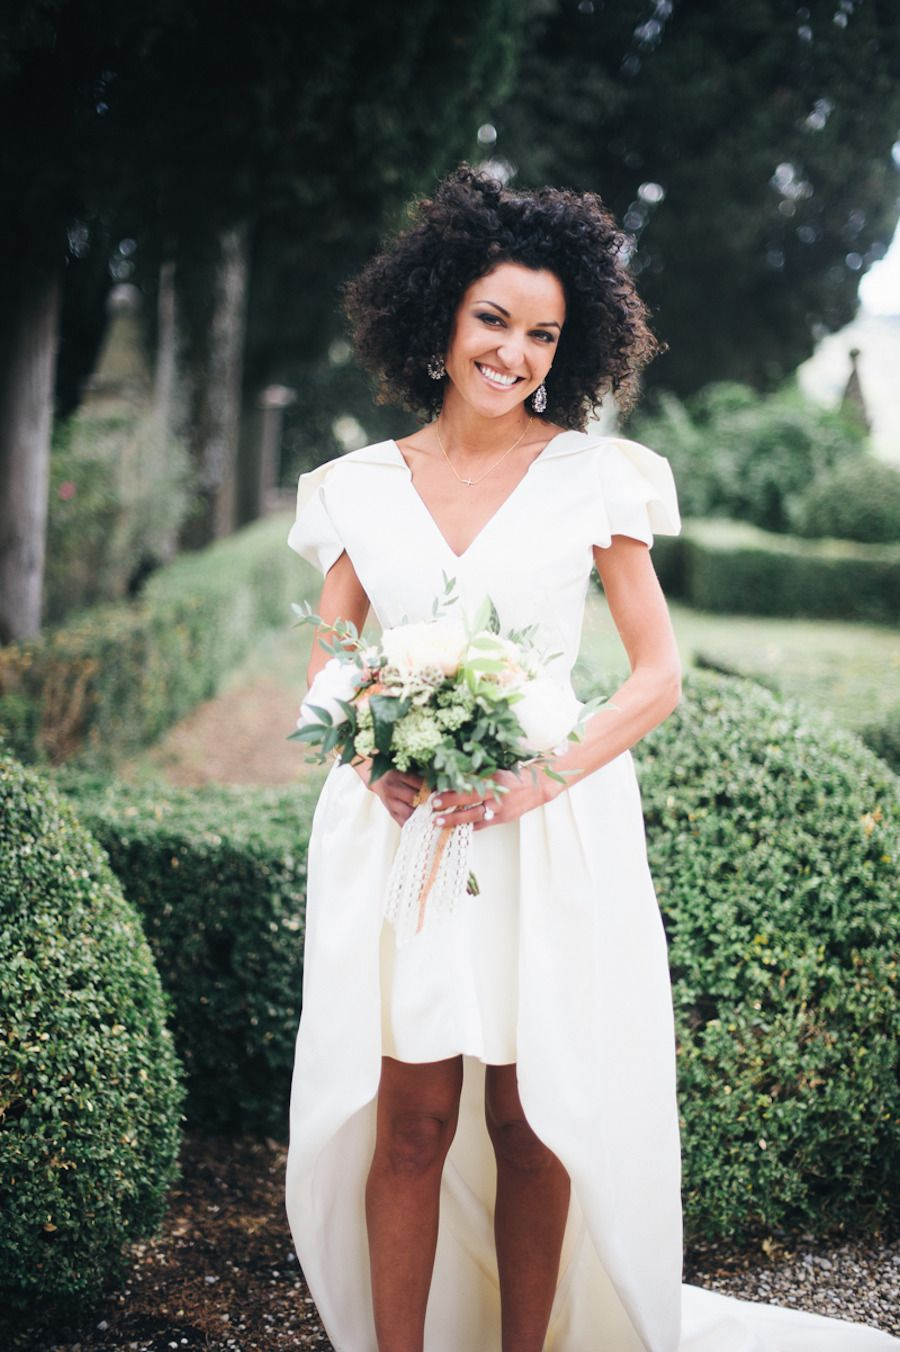 Photography: Lisa Poggi Photography -  Videographer: Matteo Castelluccia Wedding Planner: SposiamoVi Flowers: La Rosa Canina Firenze  Read More: http://www.stylemepretty.com/2014/10/22/fashionable-elopement-in-tuscany/  #wedding #stylemepretty #destinationwedding #weddingvideo